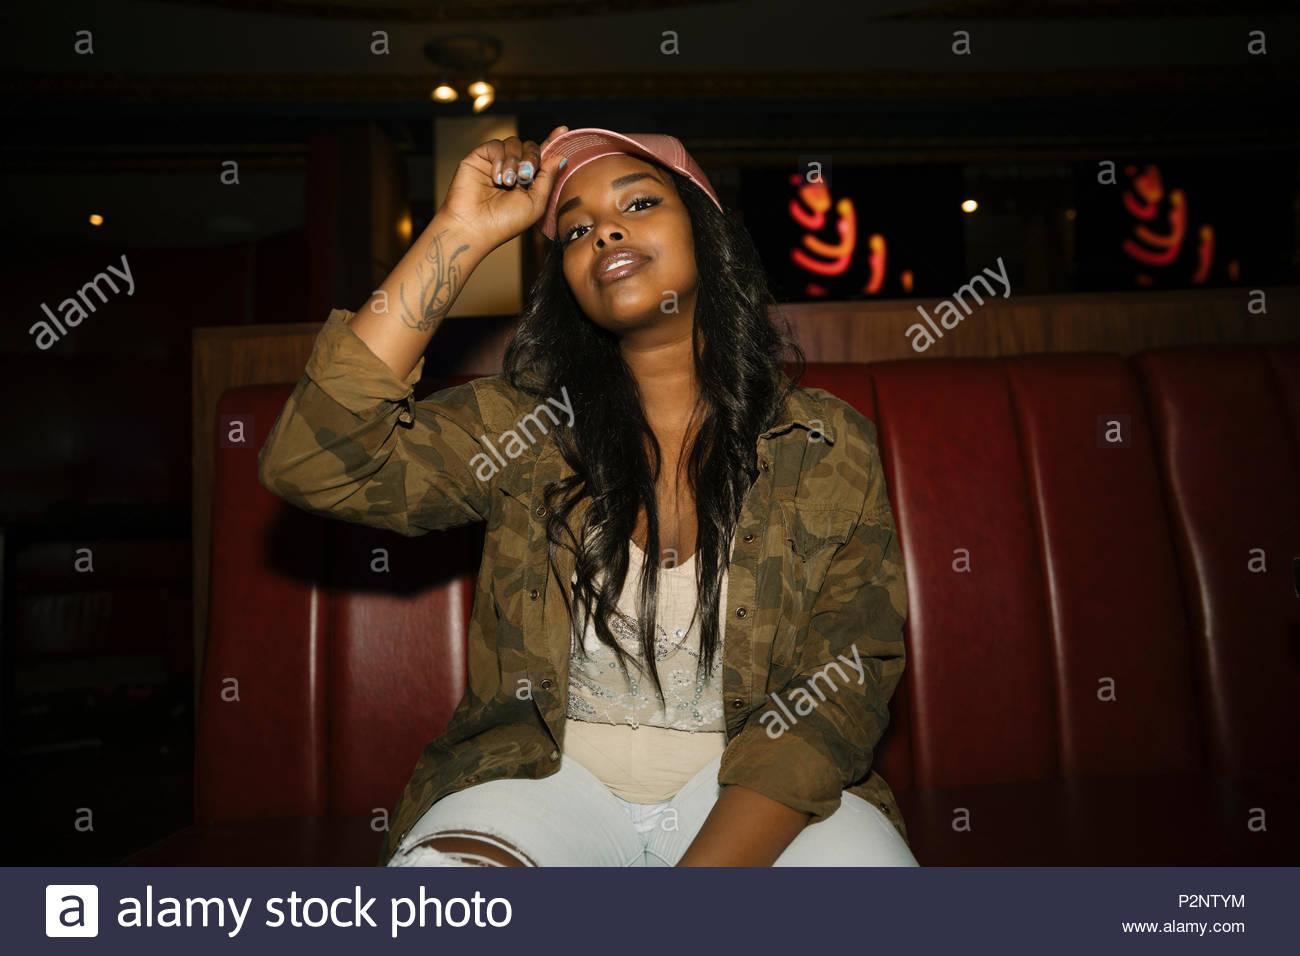 Portrait confident, cool, stylish female millennial in nightclub - Stock Image